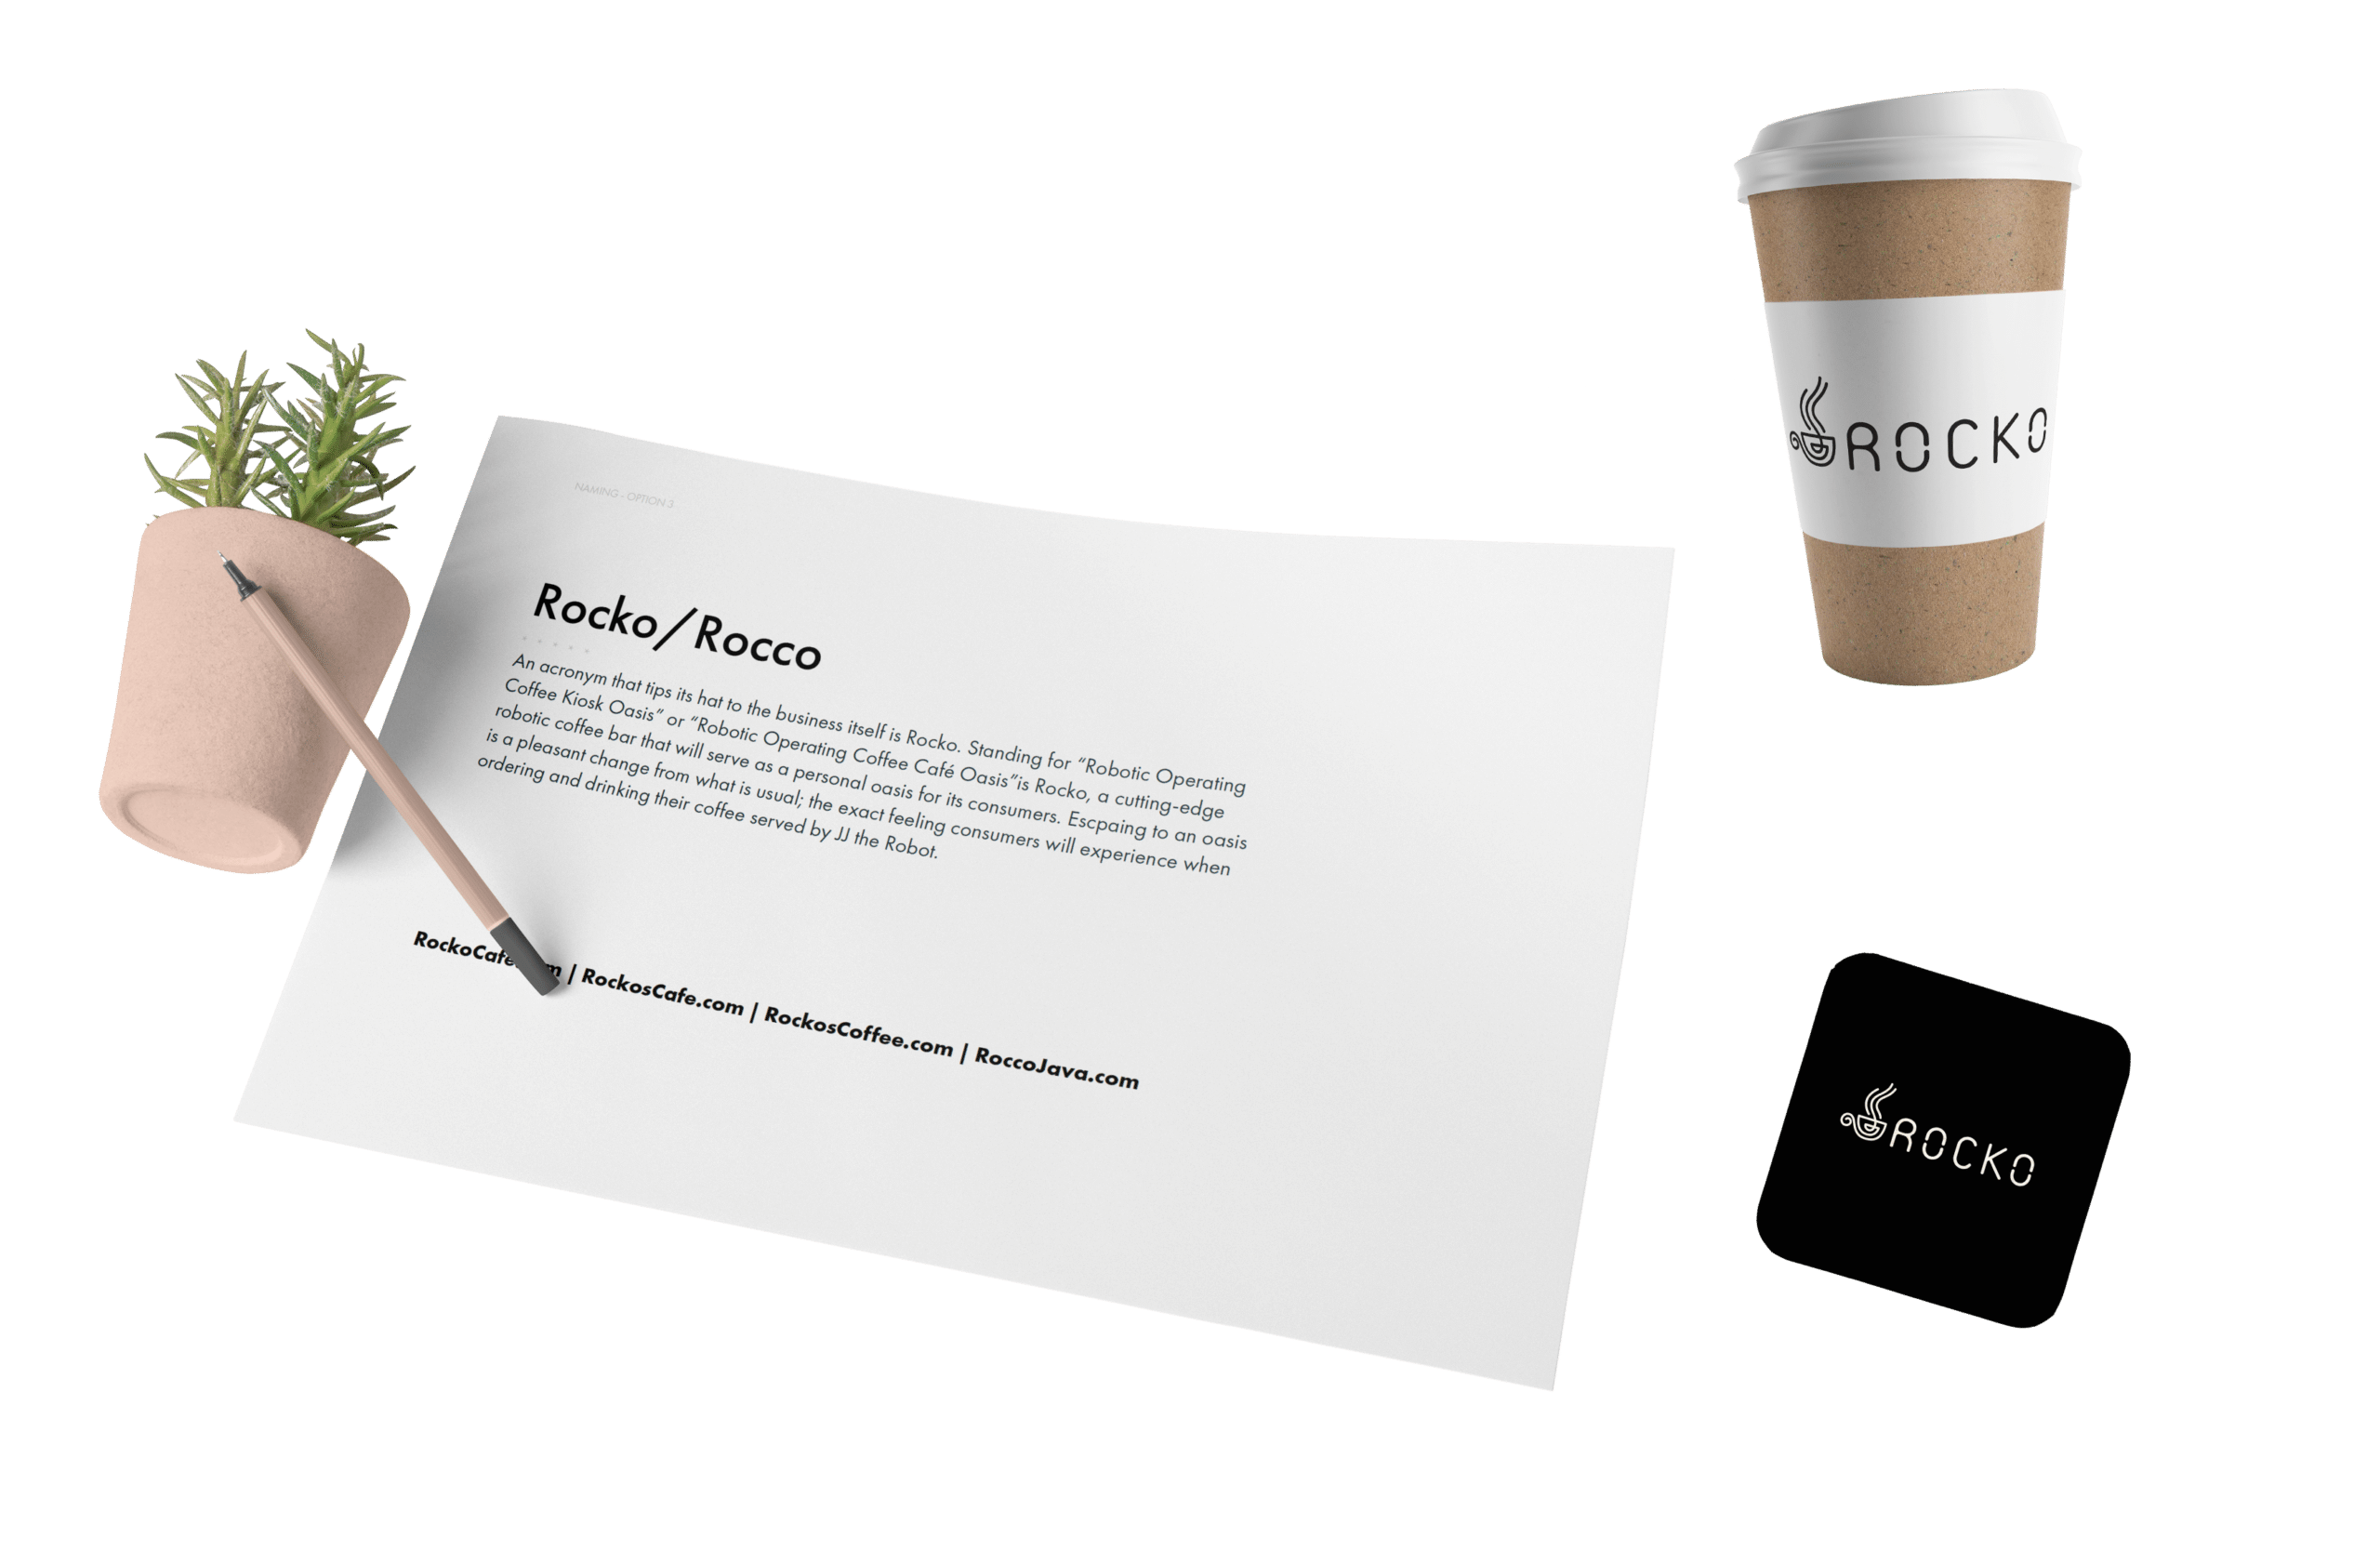 Rocko_Naming&CoffeeCup_Mockup